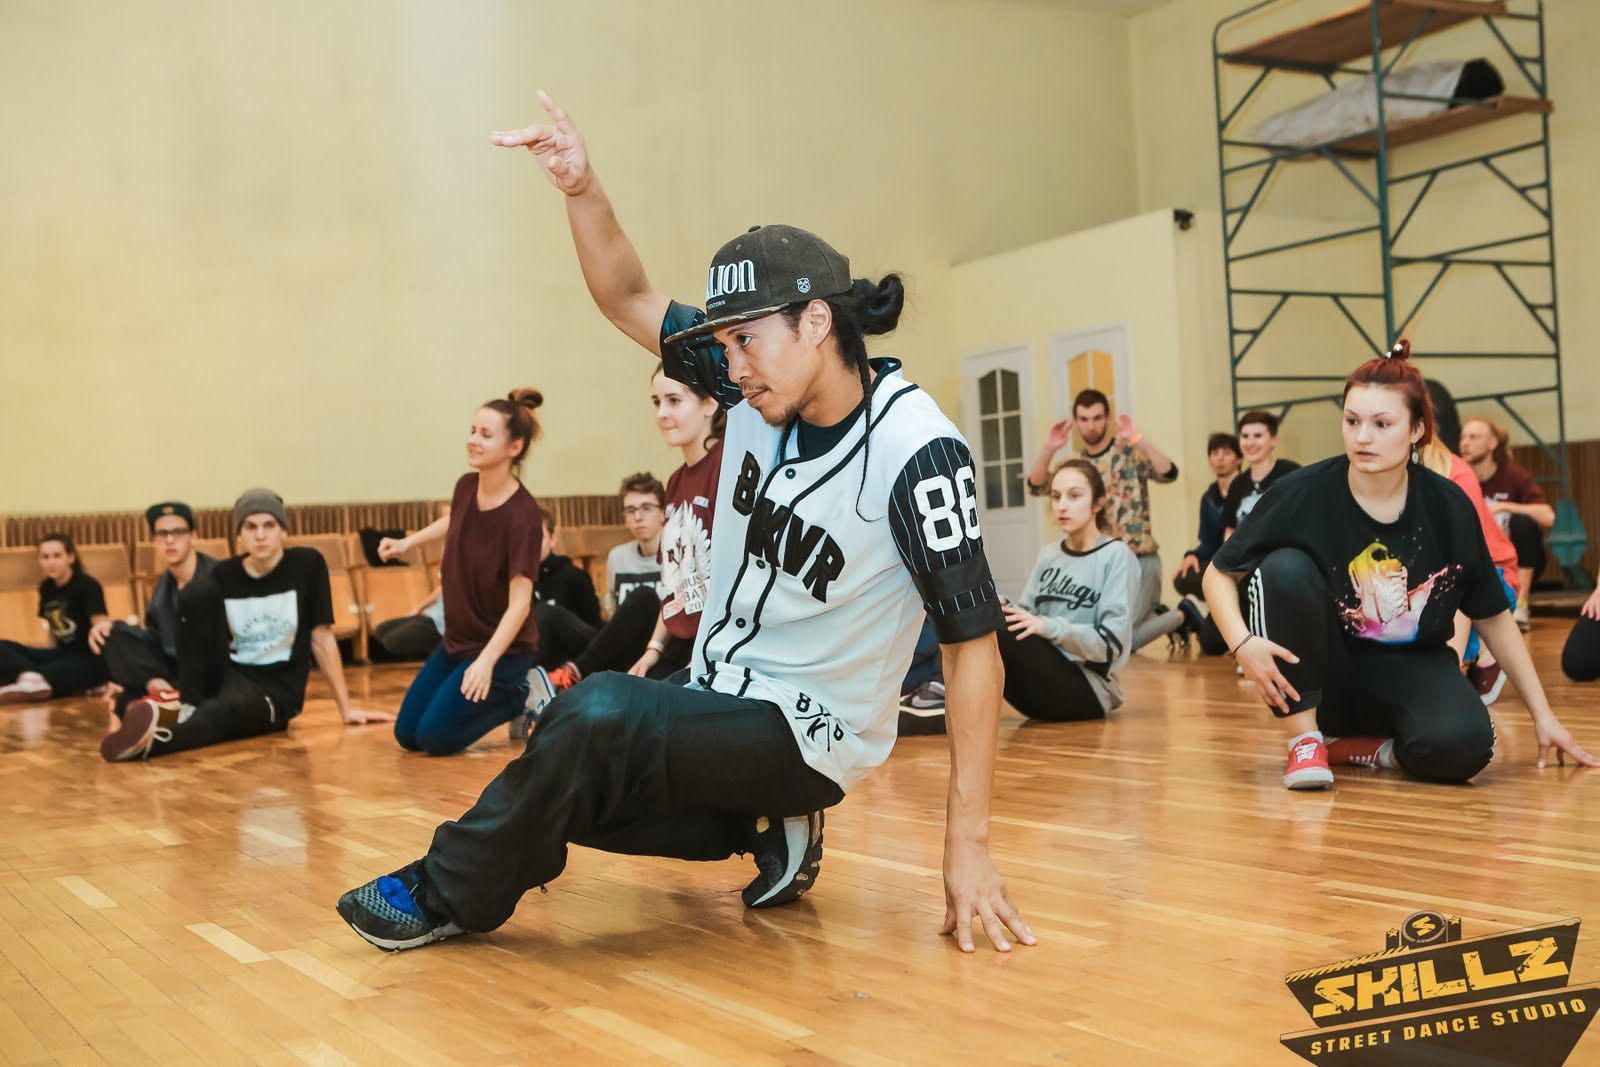 Dedson Hip Hop seminaras (FRA) - IMG_6313.jpg